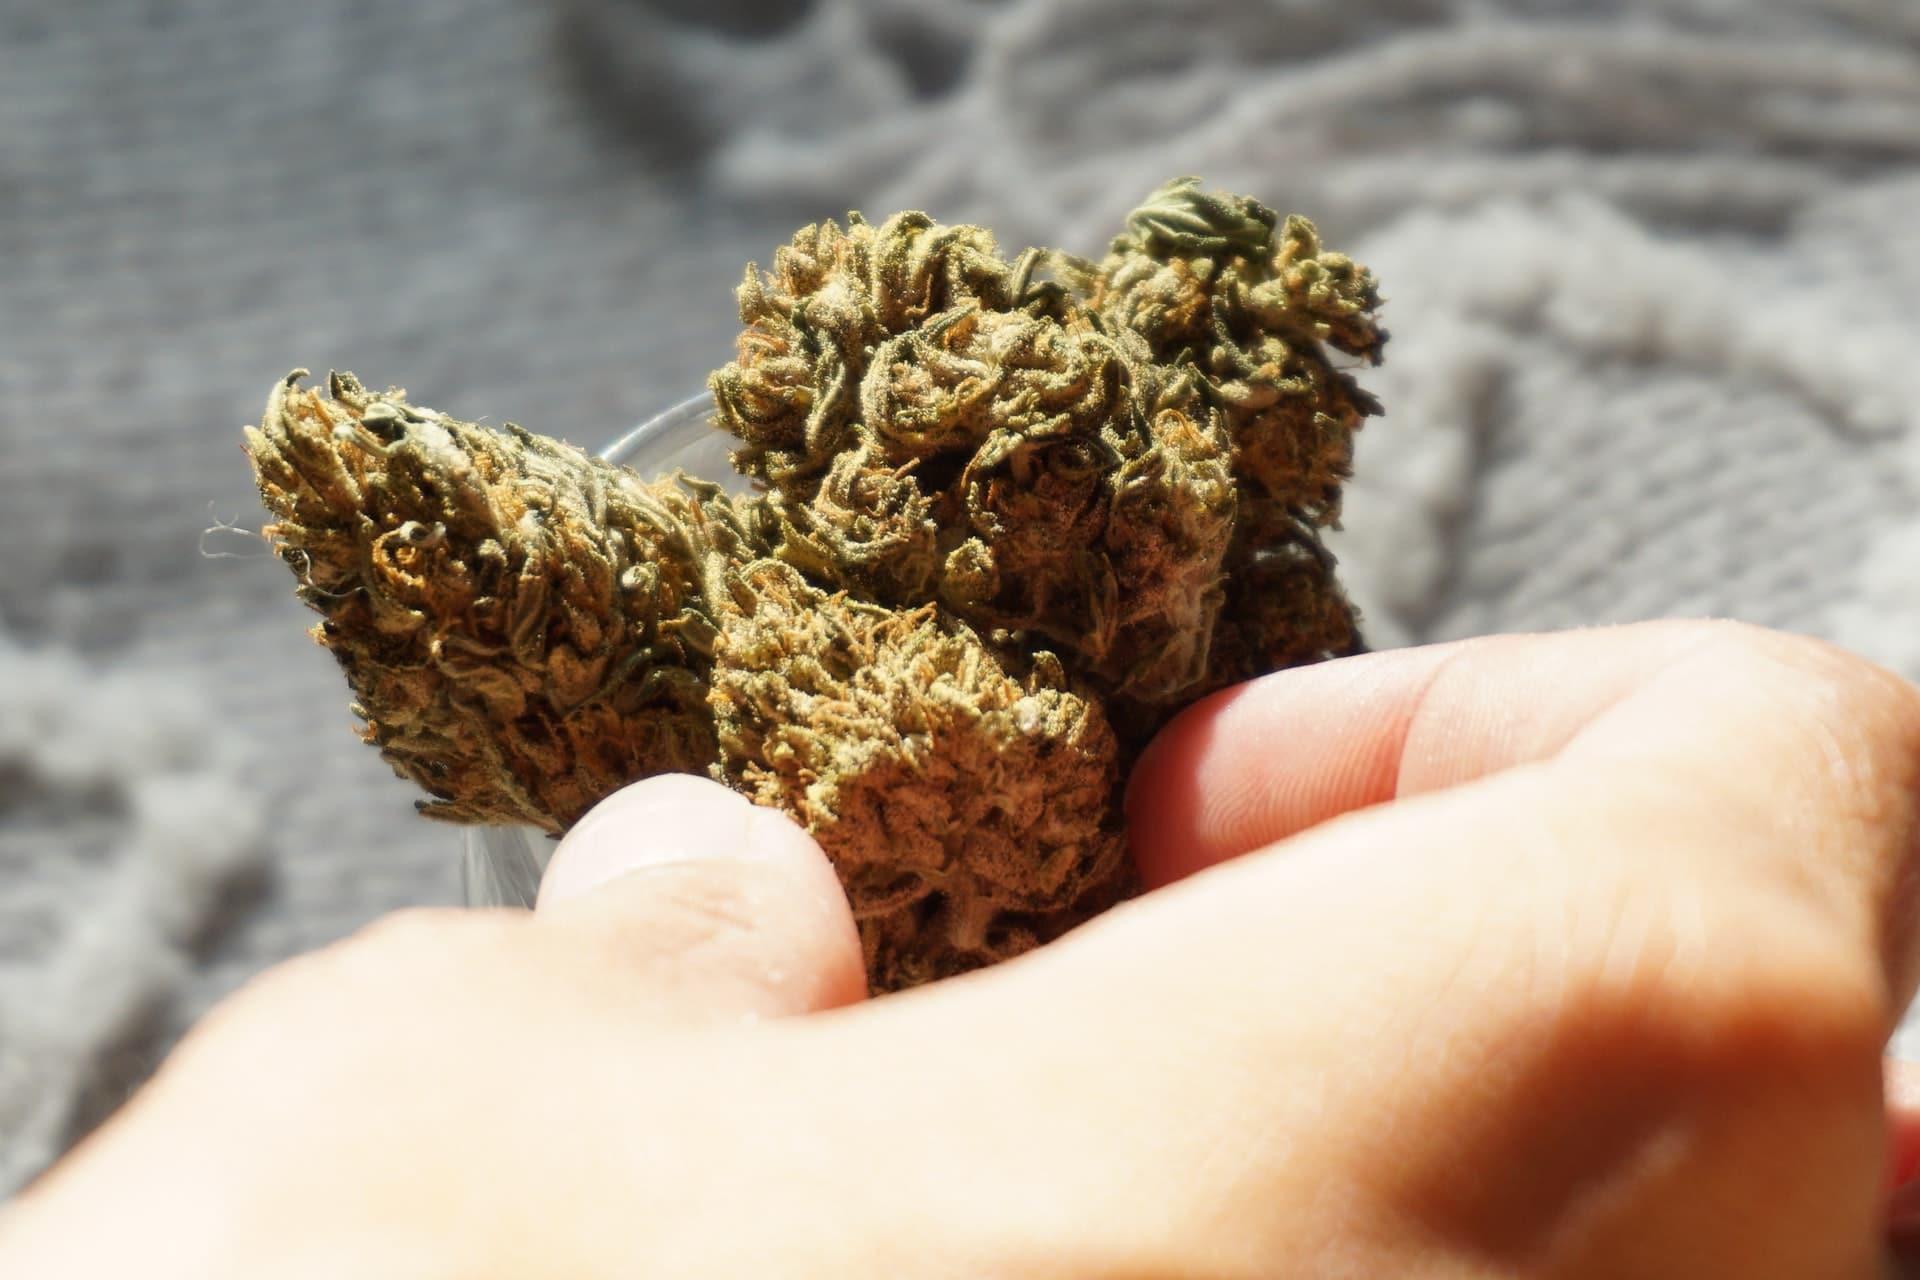 Nación Cannabis | Colorado busca restringir uso de marihuana medicinal